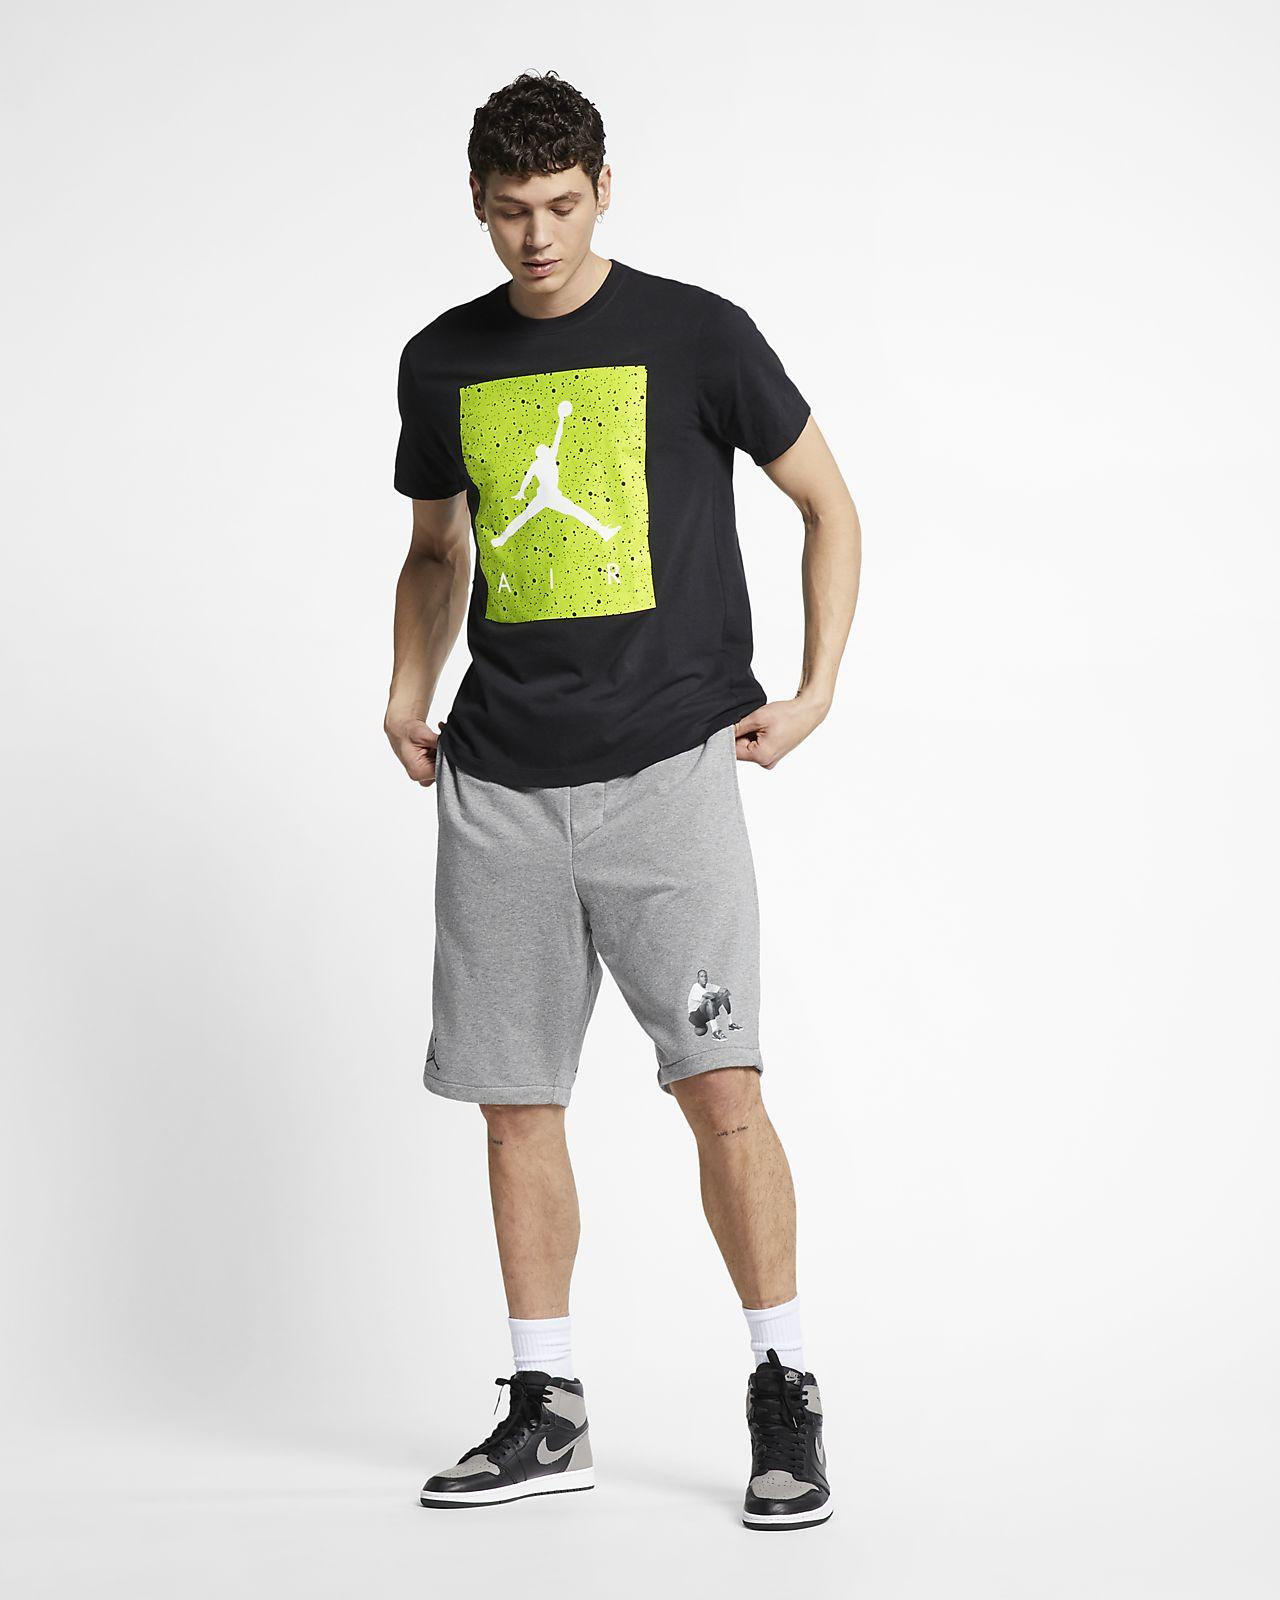 quality design 104a5 36052 ... Jordan Poolside Men s T-Shirt